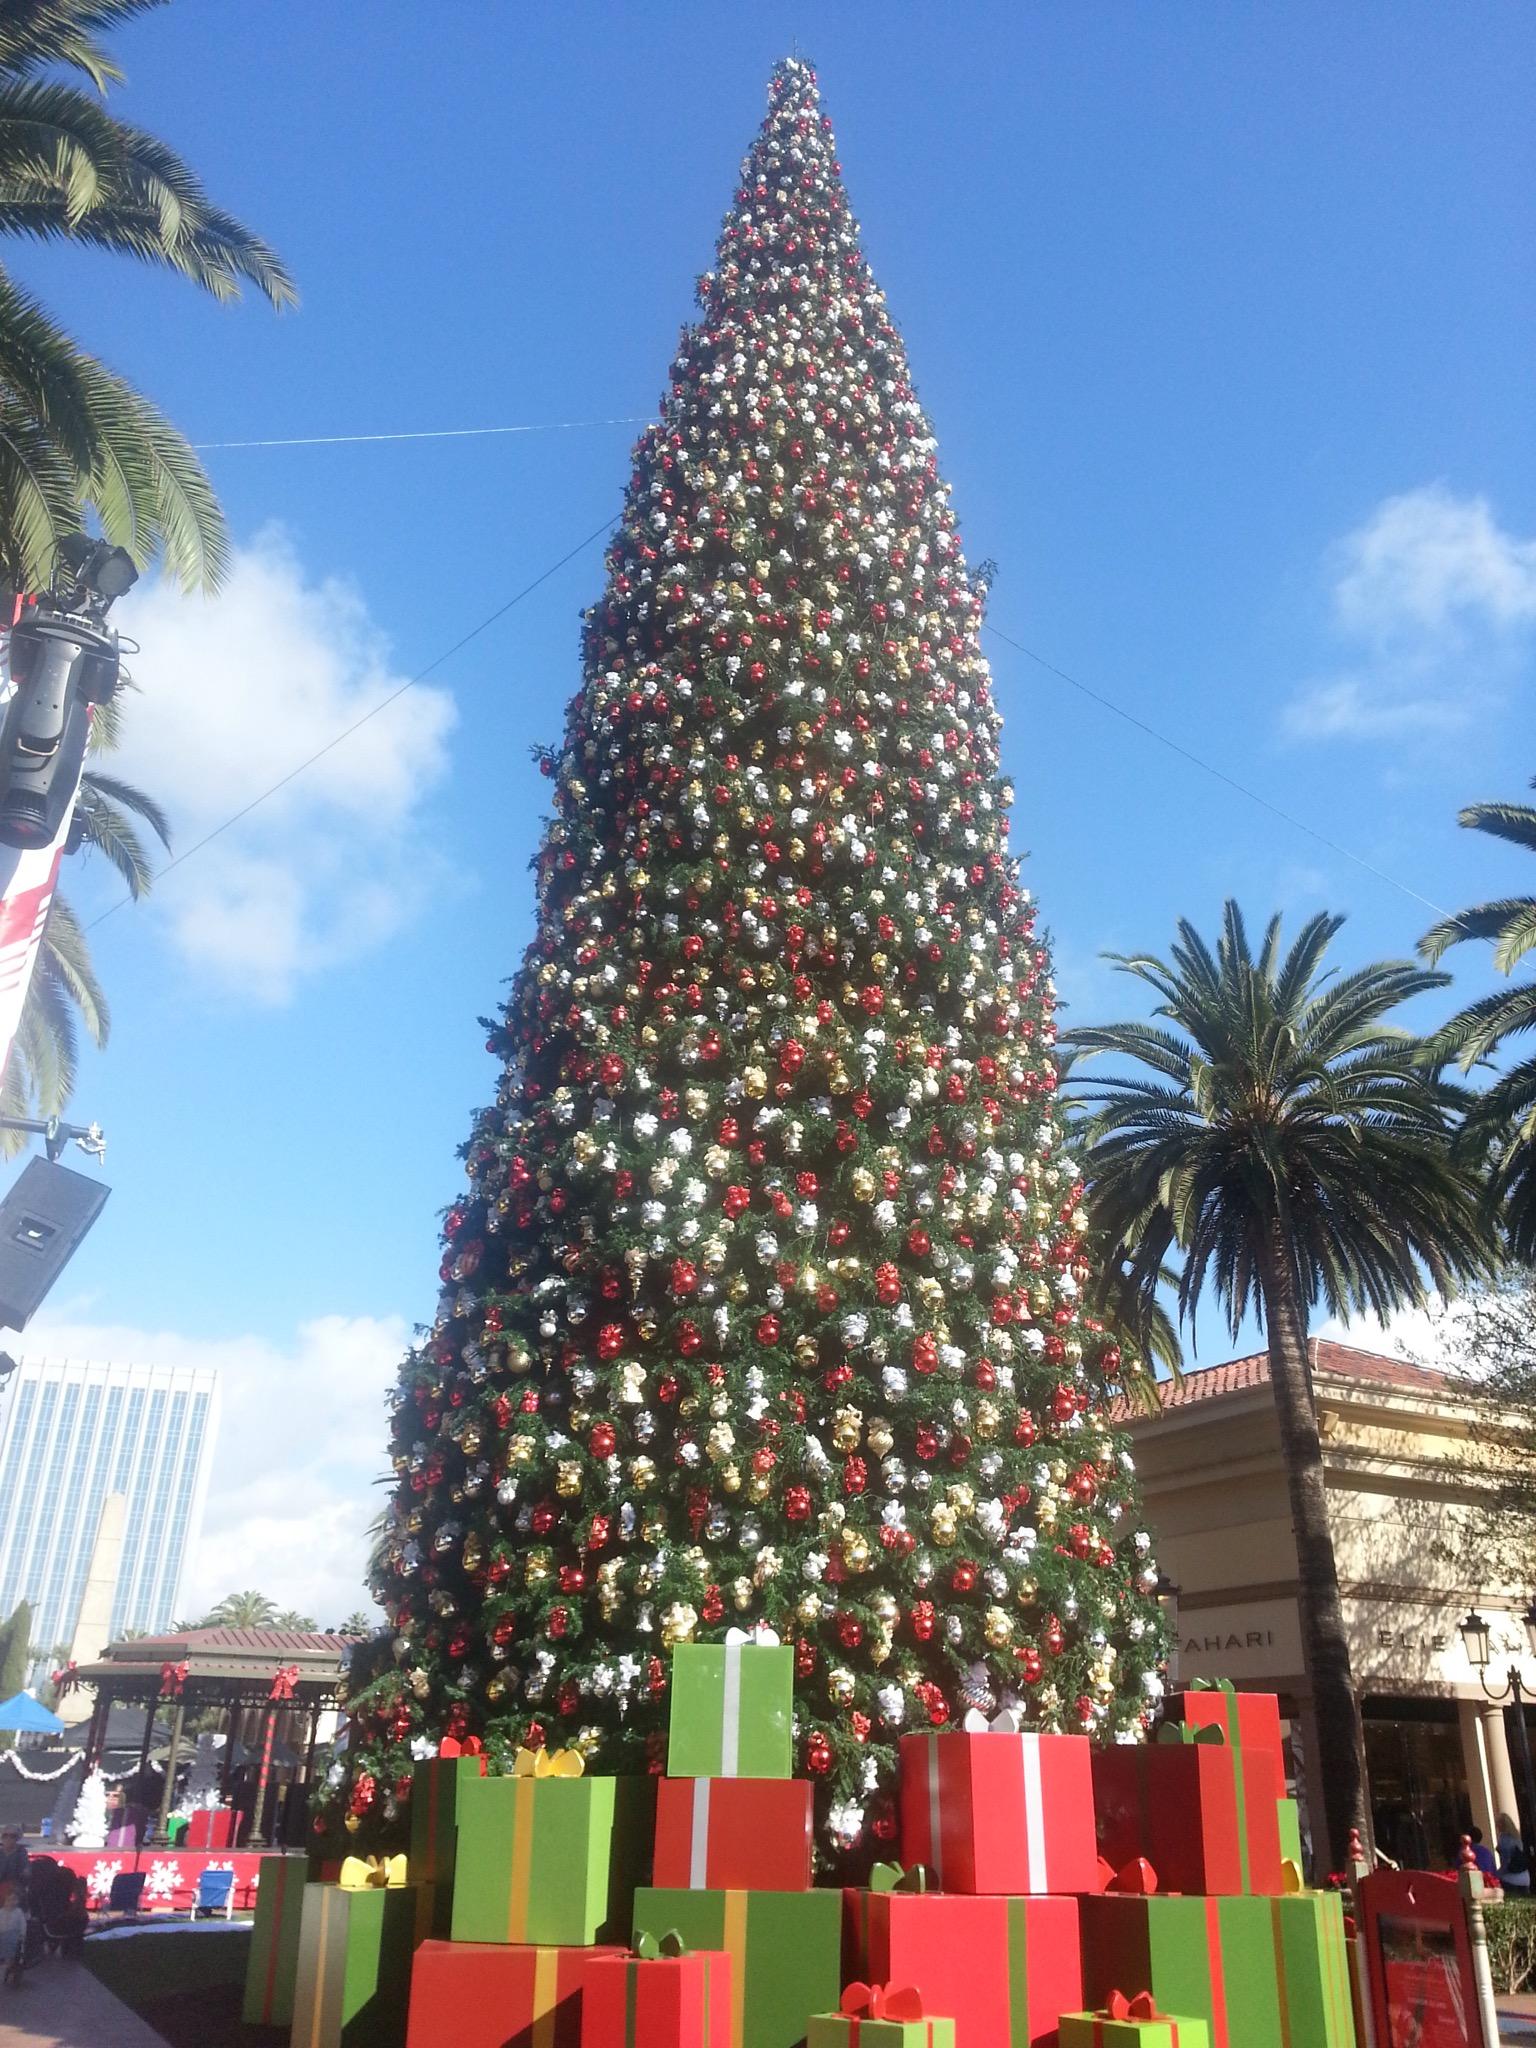 Newport Beach Fashion Island Holiday Tree Lighting Friday November ...